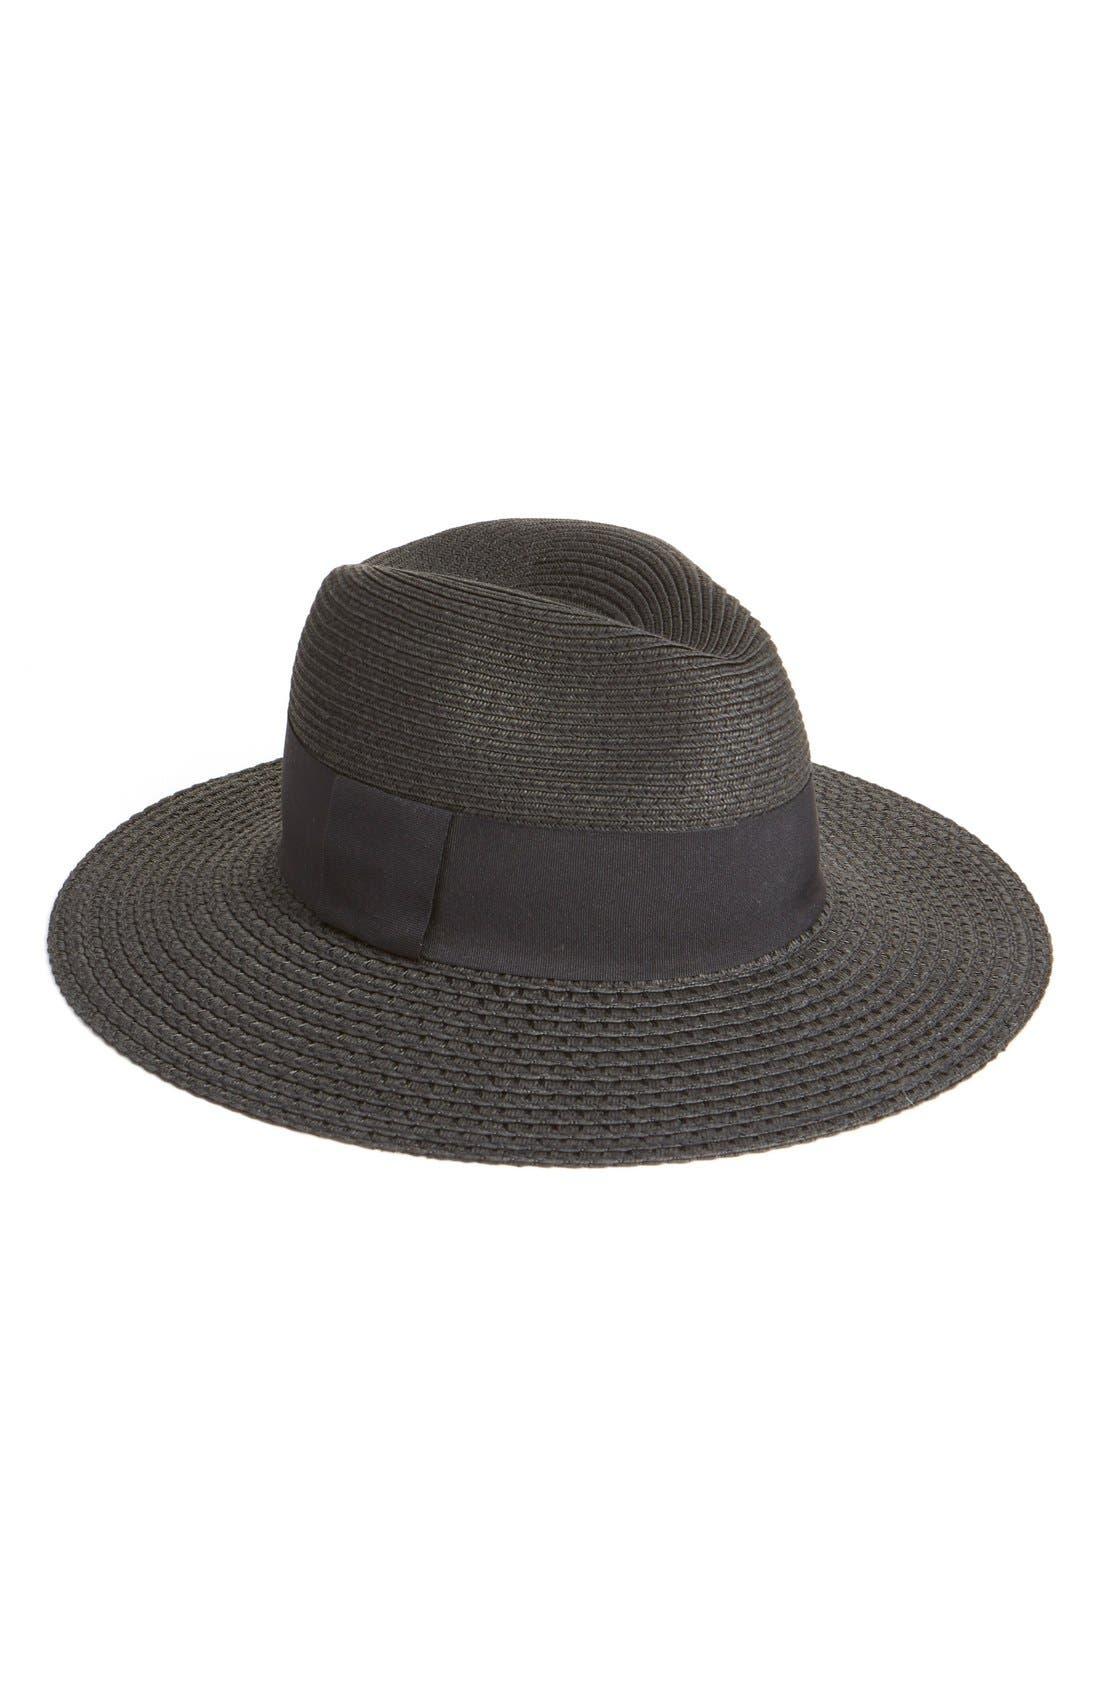 Wide Brim Straw Panama Hat,                         Main,                         color, 001